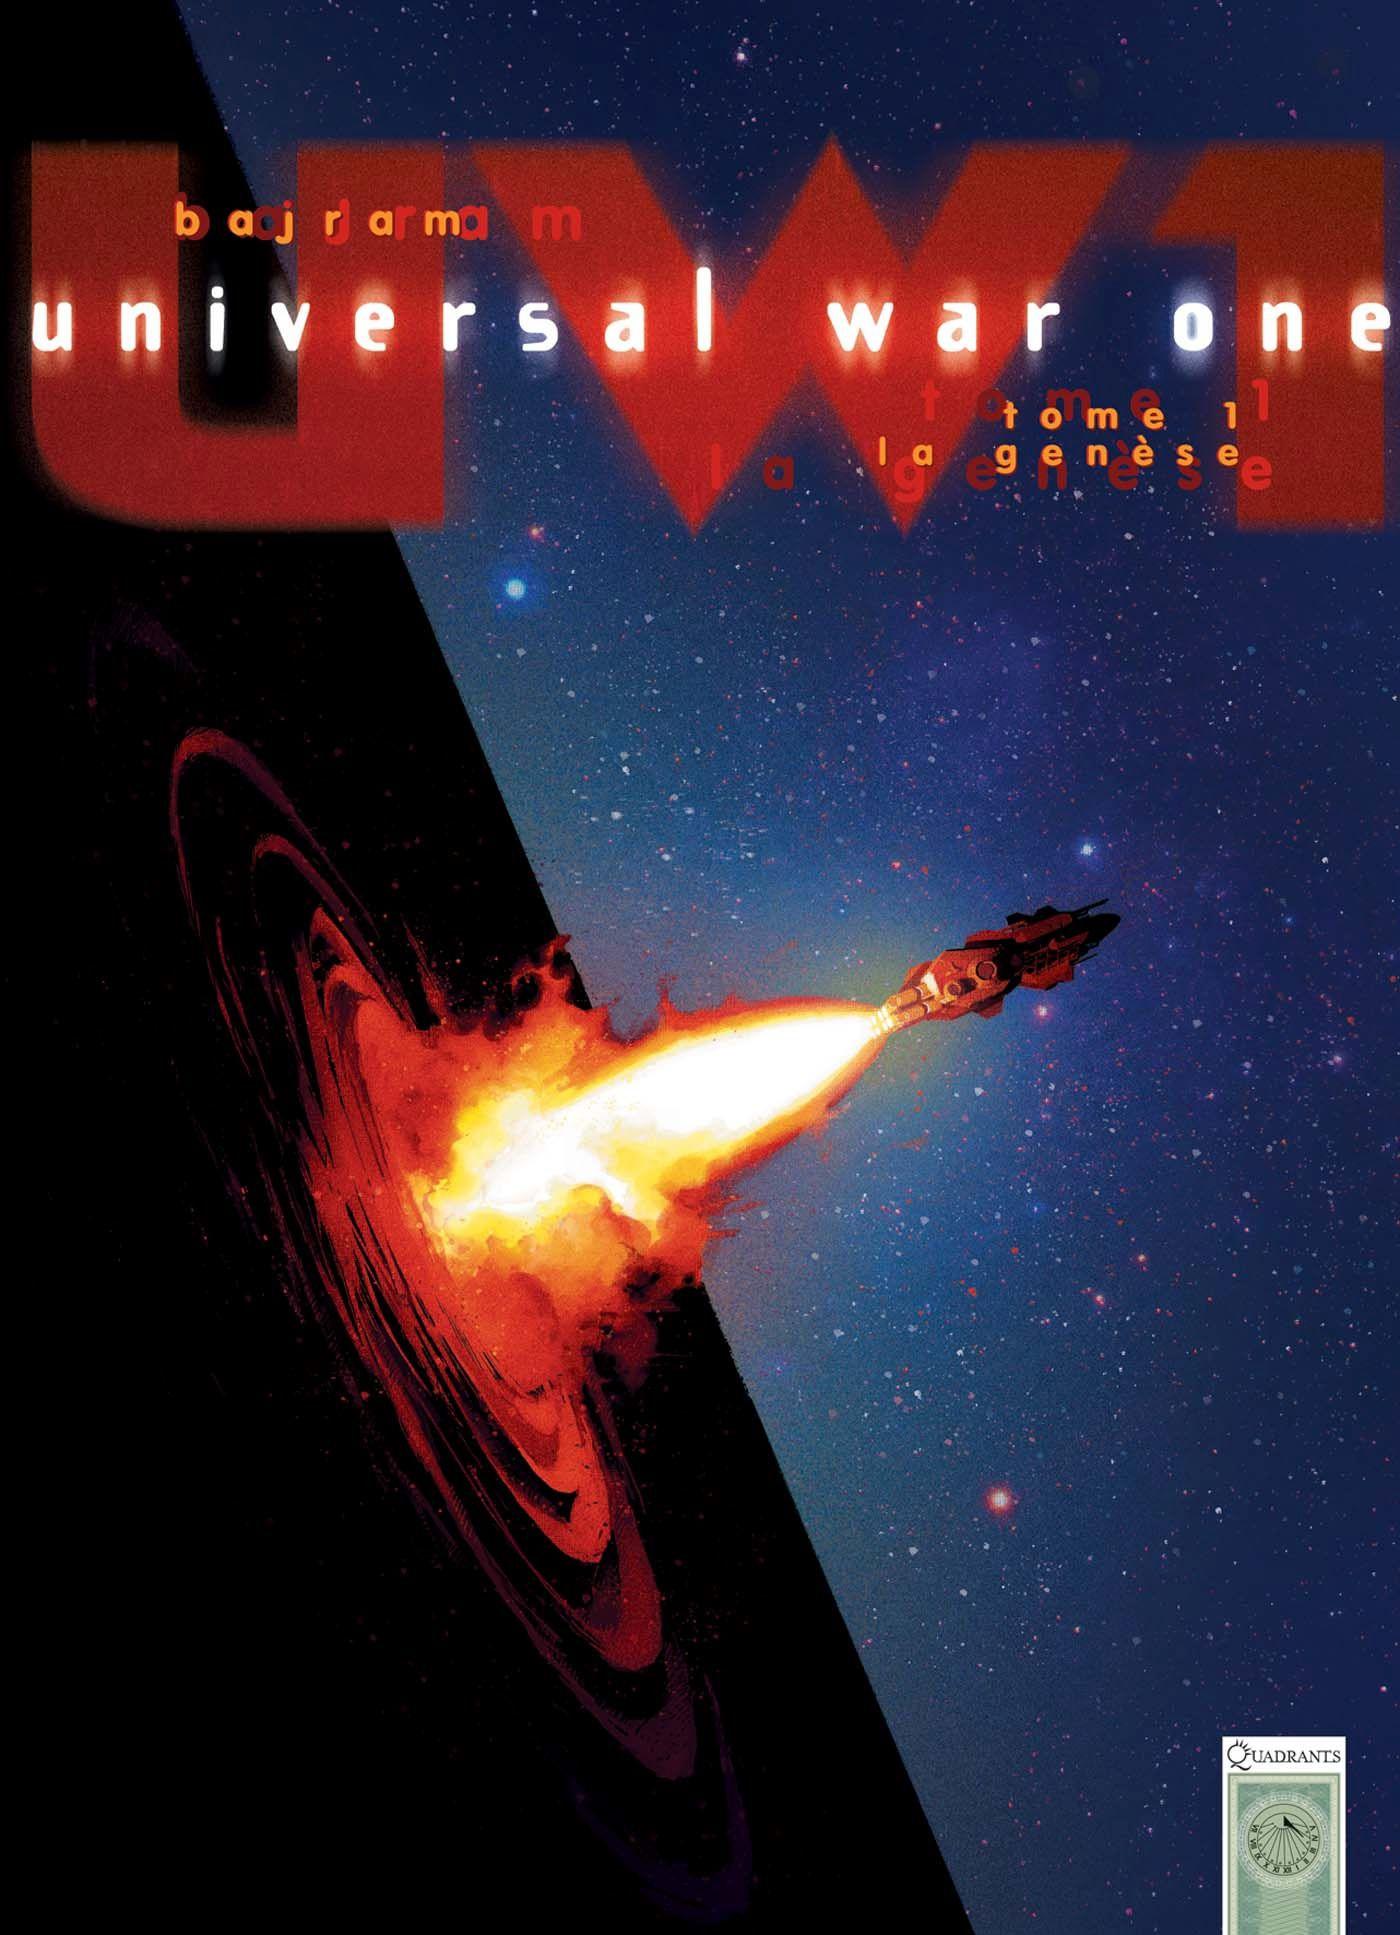 La Genèse - Universal War One, Tome 1 - Denis Bajram encequiconcerne La Vavache Tome 1 Plifplafplouf